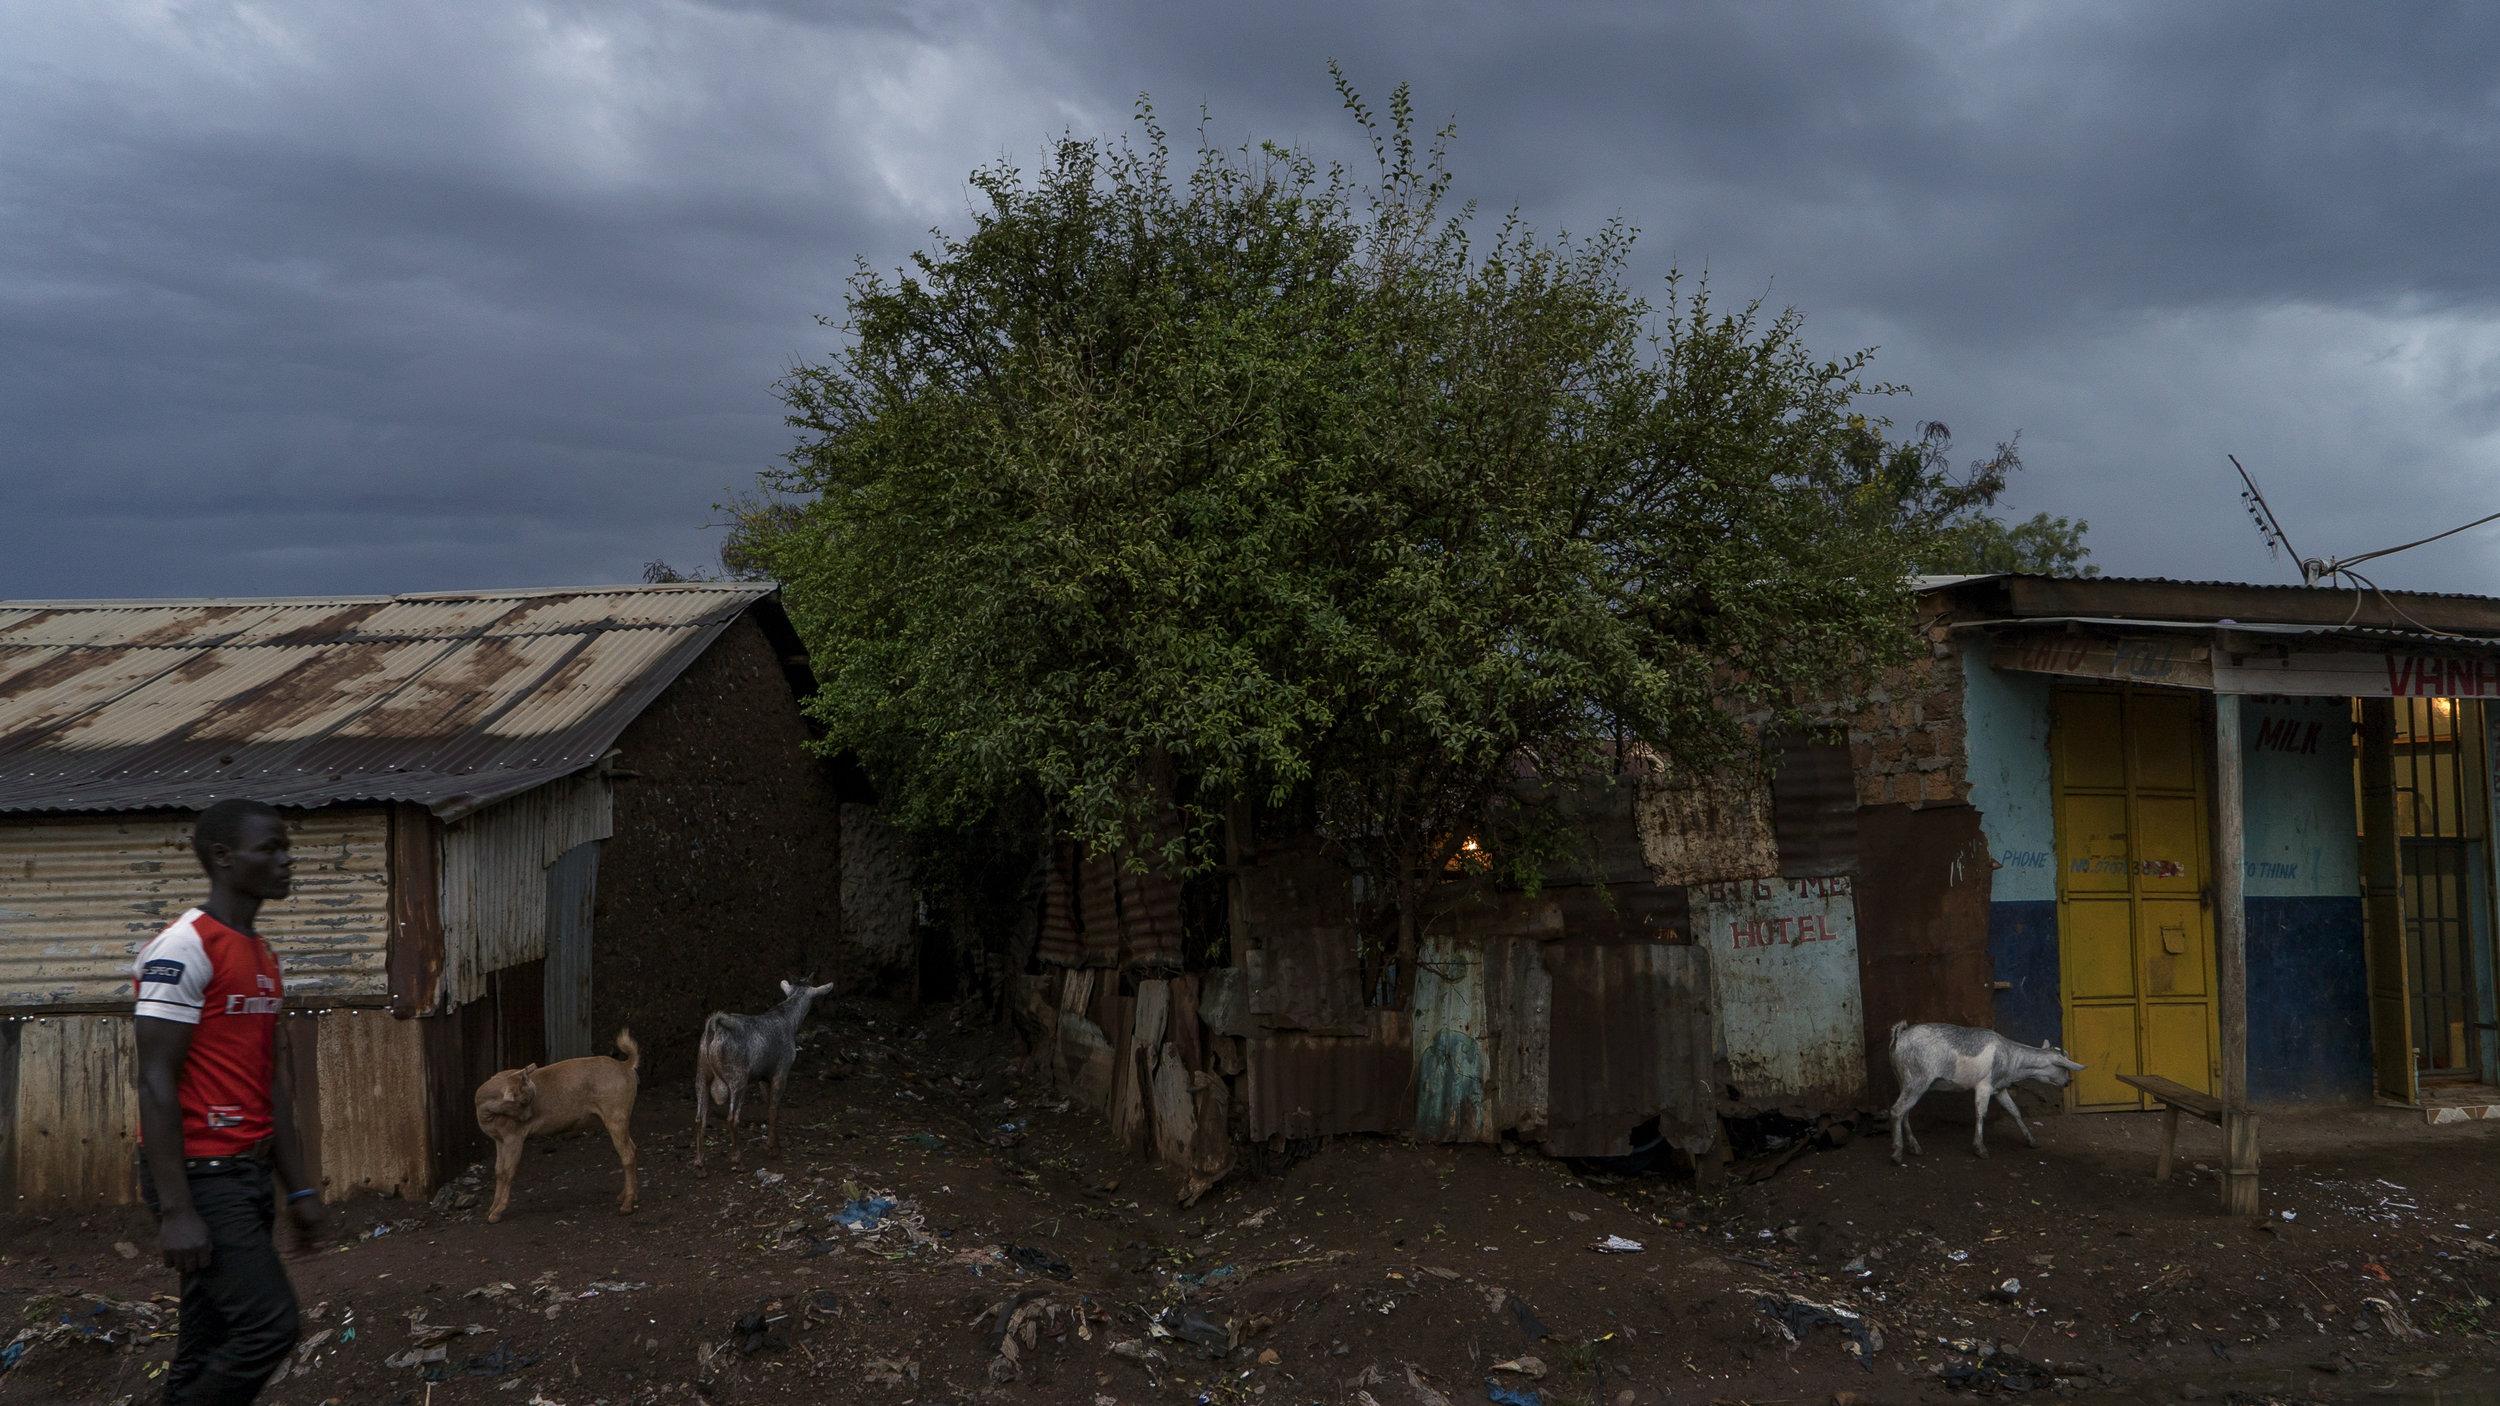 Manyatta, Kisumu, Kenya, across the way from where Olima normally stays.